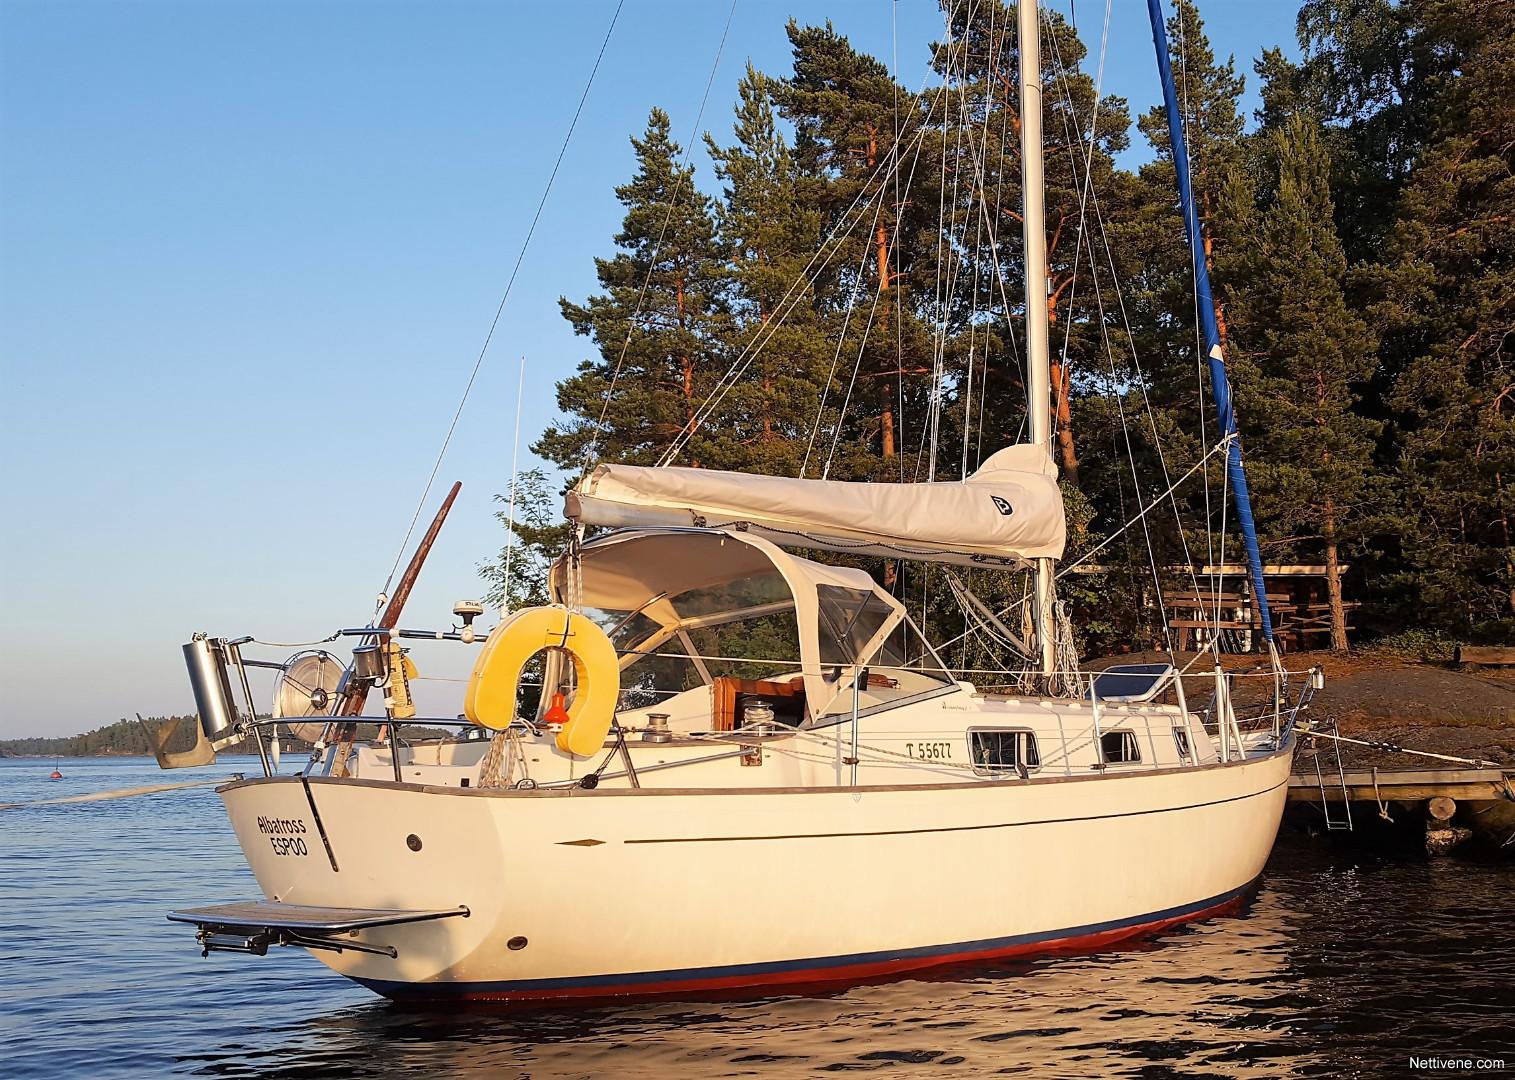 Hallberg Rassy 31 Monsun Sailing Boat 1977 Espoo Nettivene